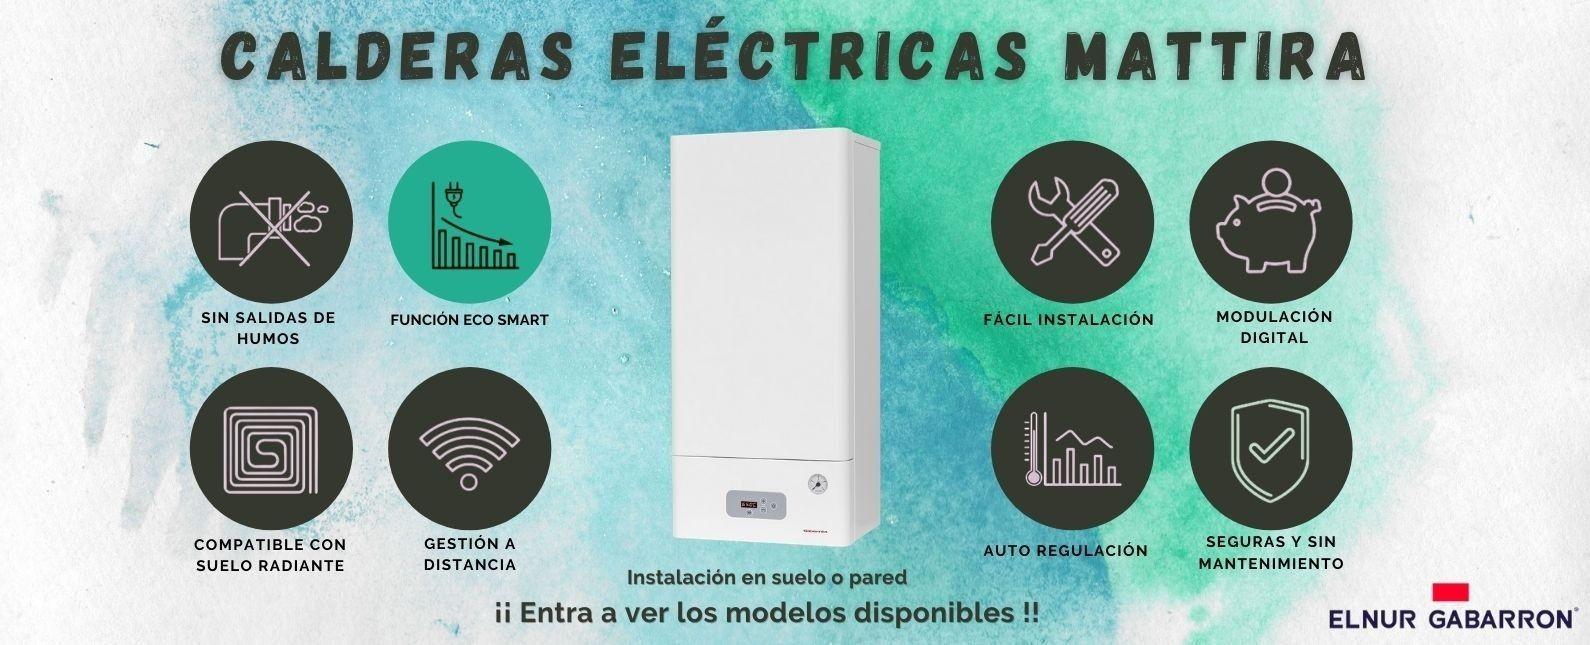 Calderas eléctricas Gabarrón Mattira